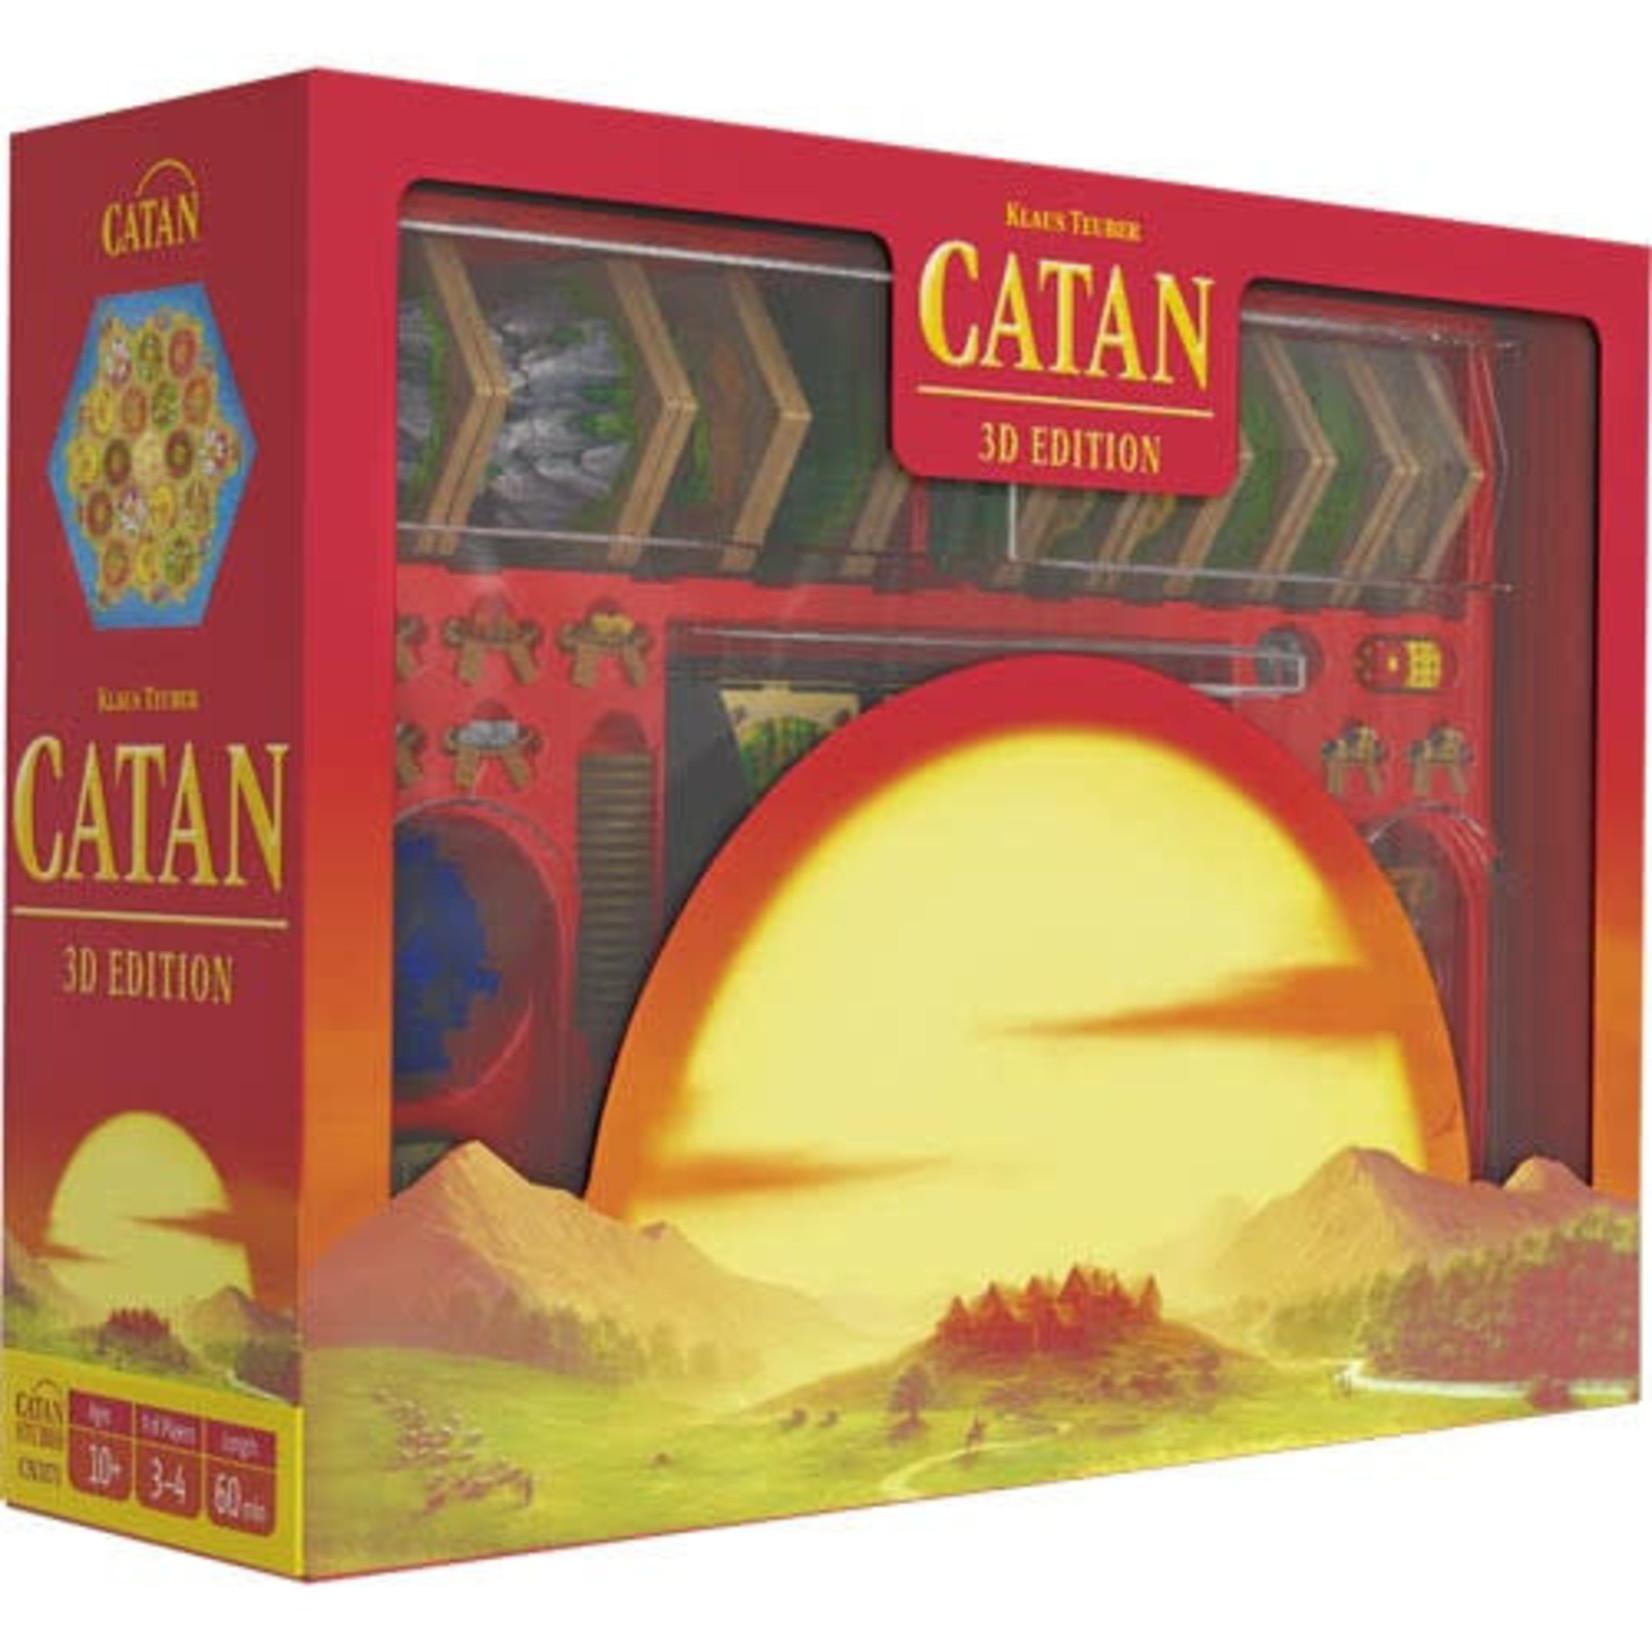 Catan - 3D Edition Board Game